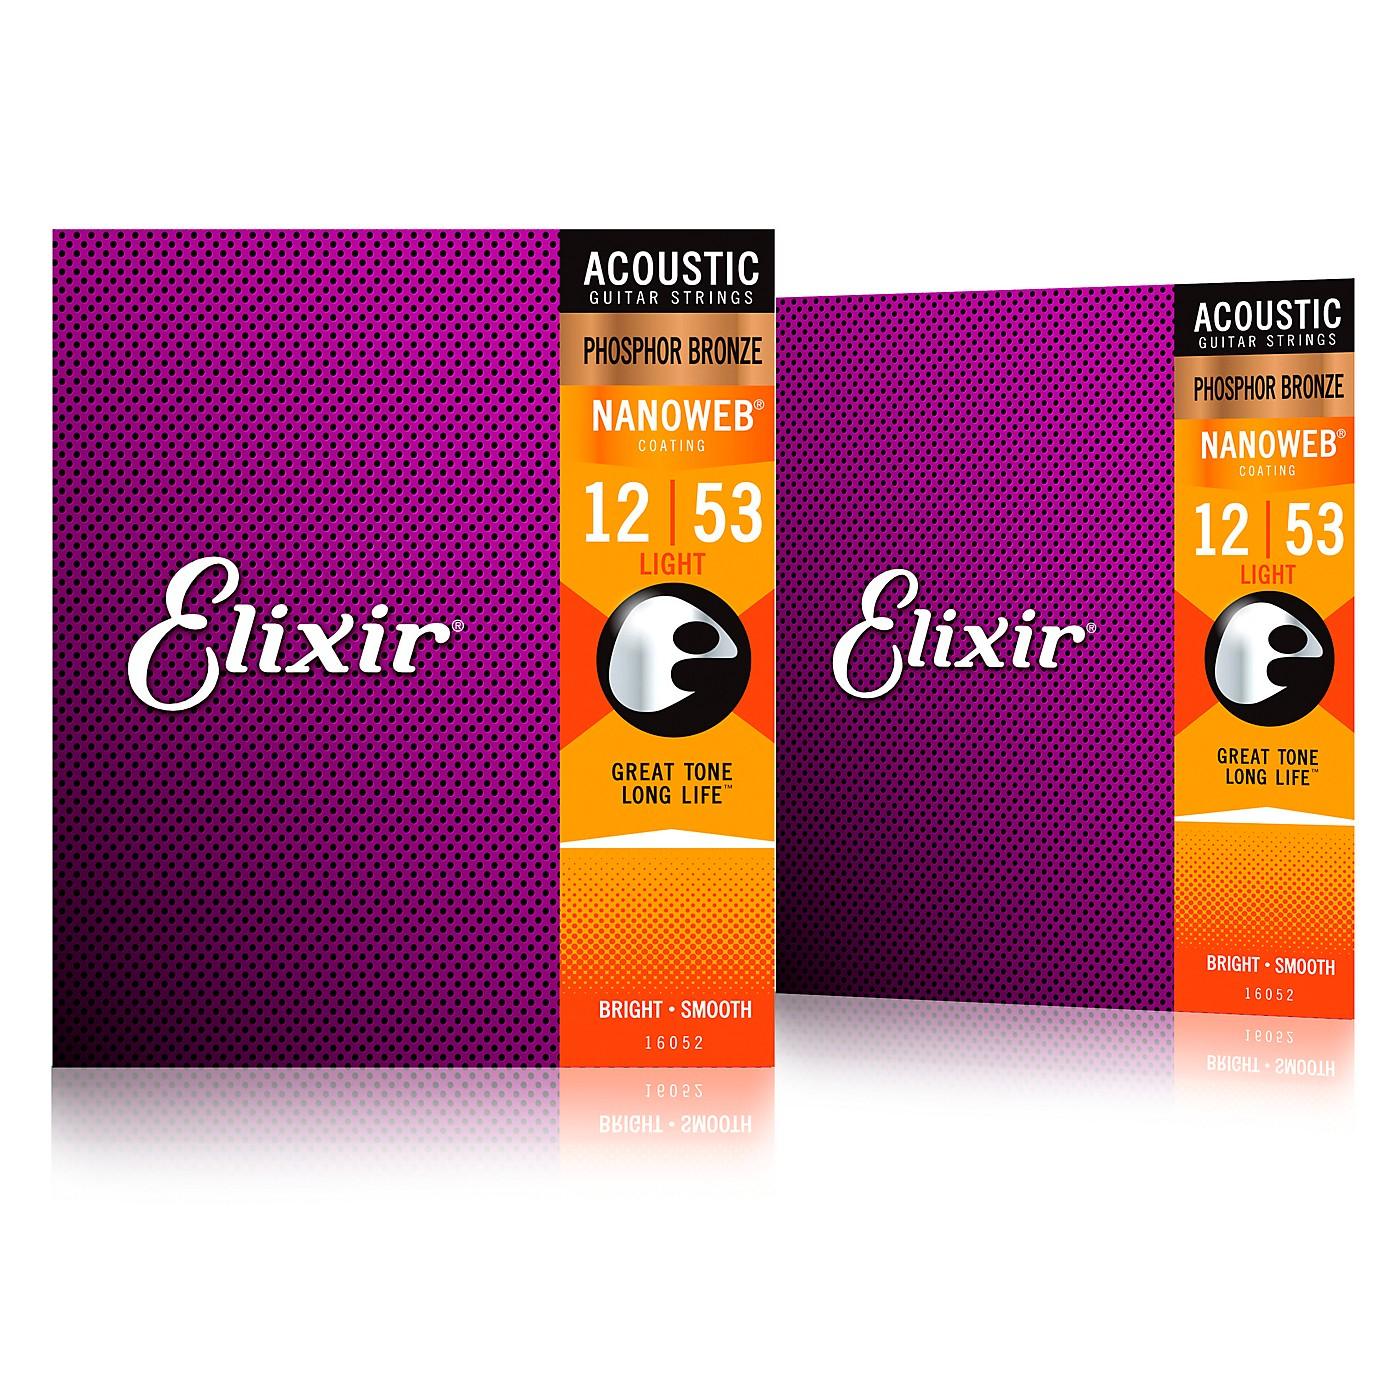 Elixir Phosphor Bronze Acoustic Guitar Strings with NANOWEB Coating, Light (.012-.053) 2-Pack thumbnail